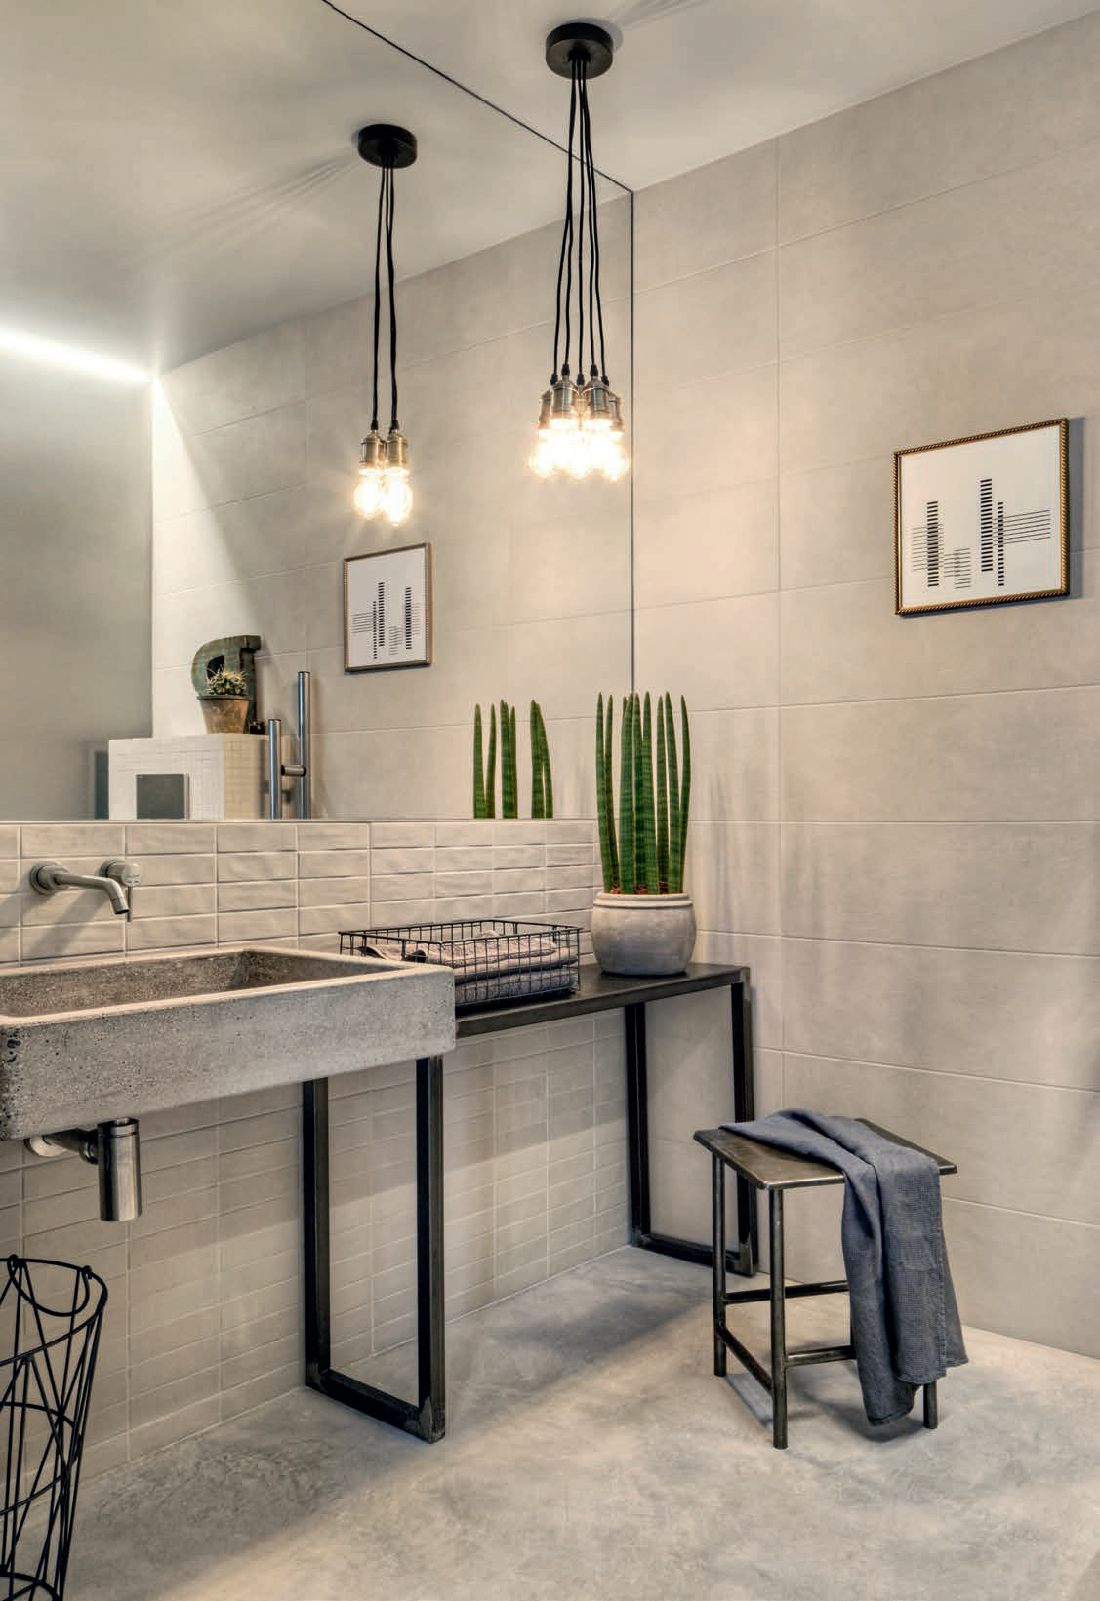 #Marazzi #Chalk Sand 25x76 cm M02E   #Porcelain stoneware #Stone #25x76   on #bathroom39.com at 31 Euro/sqm   #tiles #ceramic #floor #bathroom #kitchen #outdoor